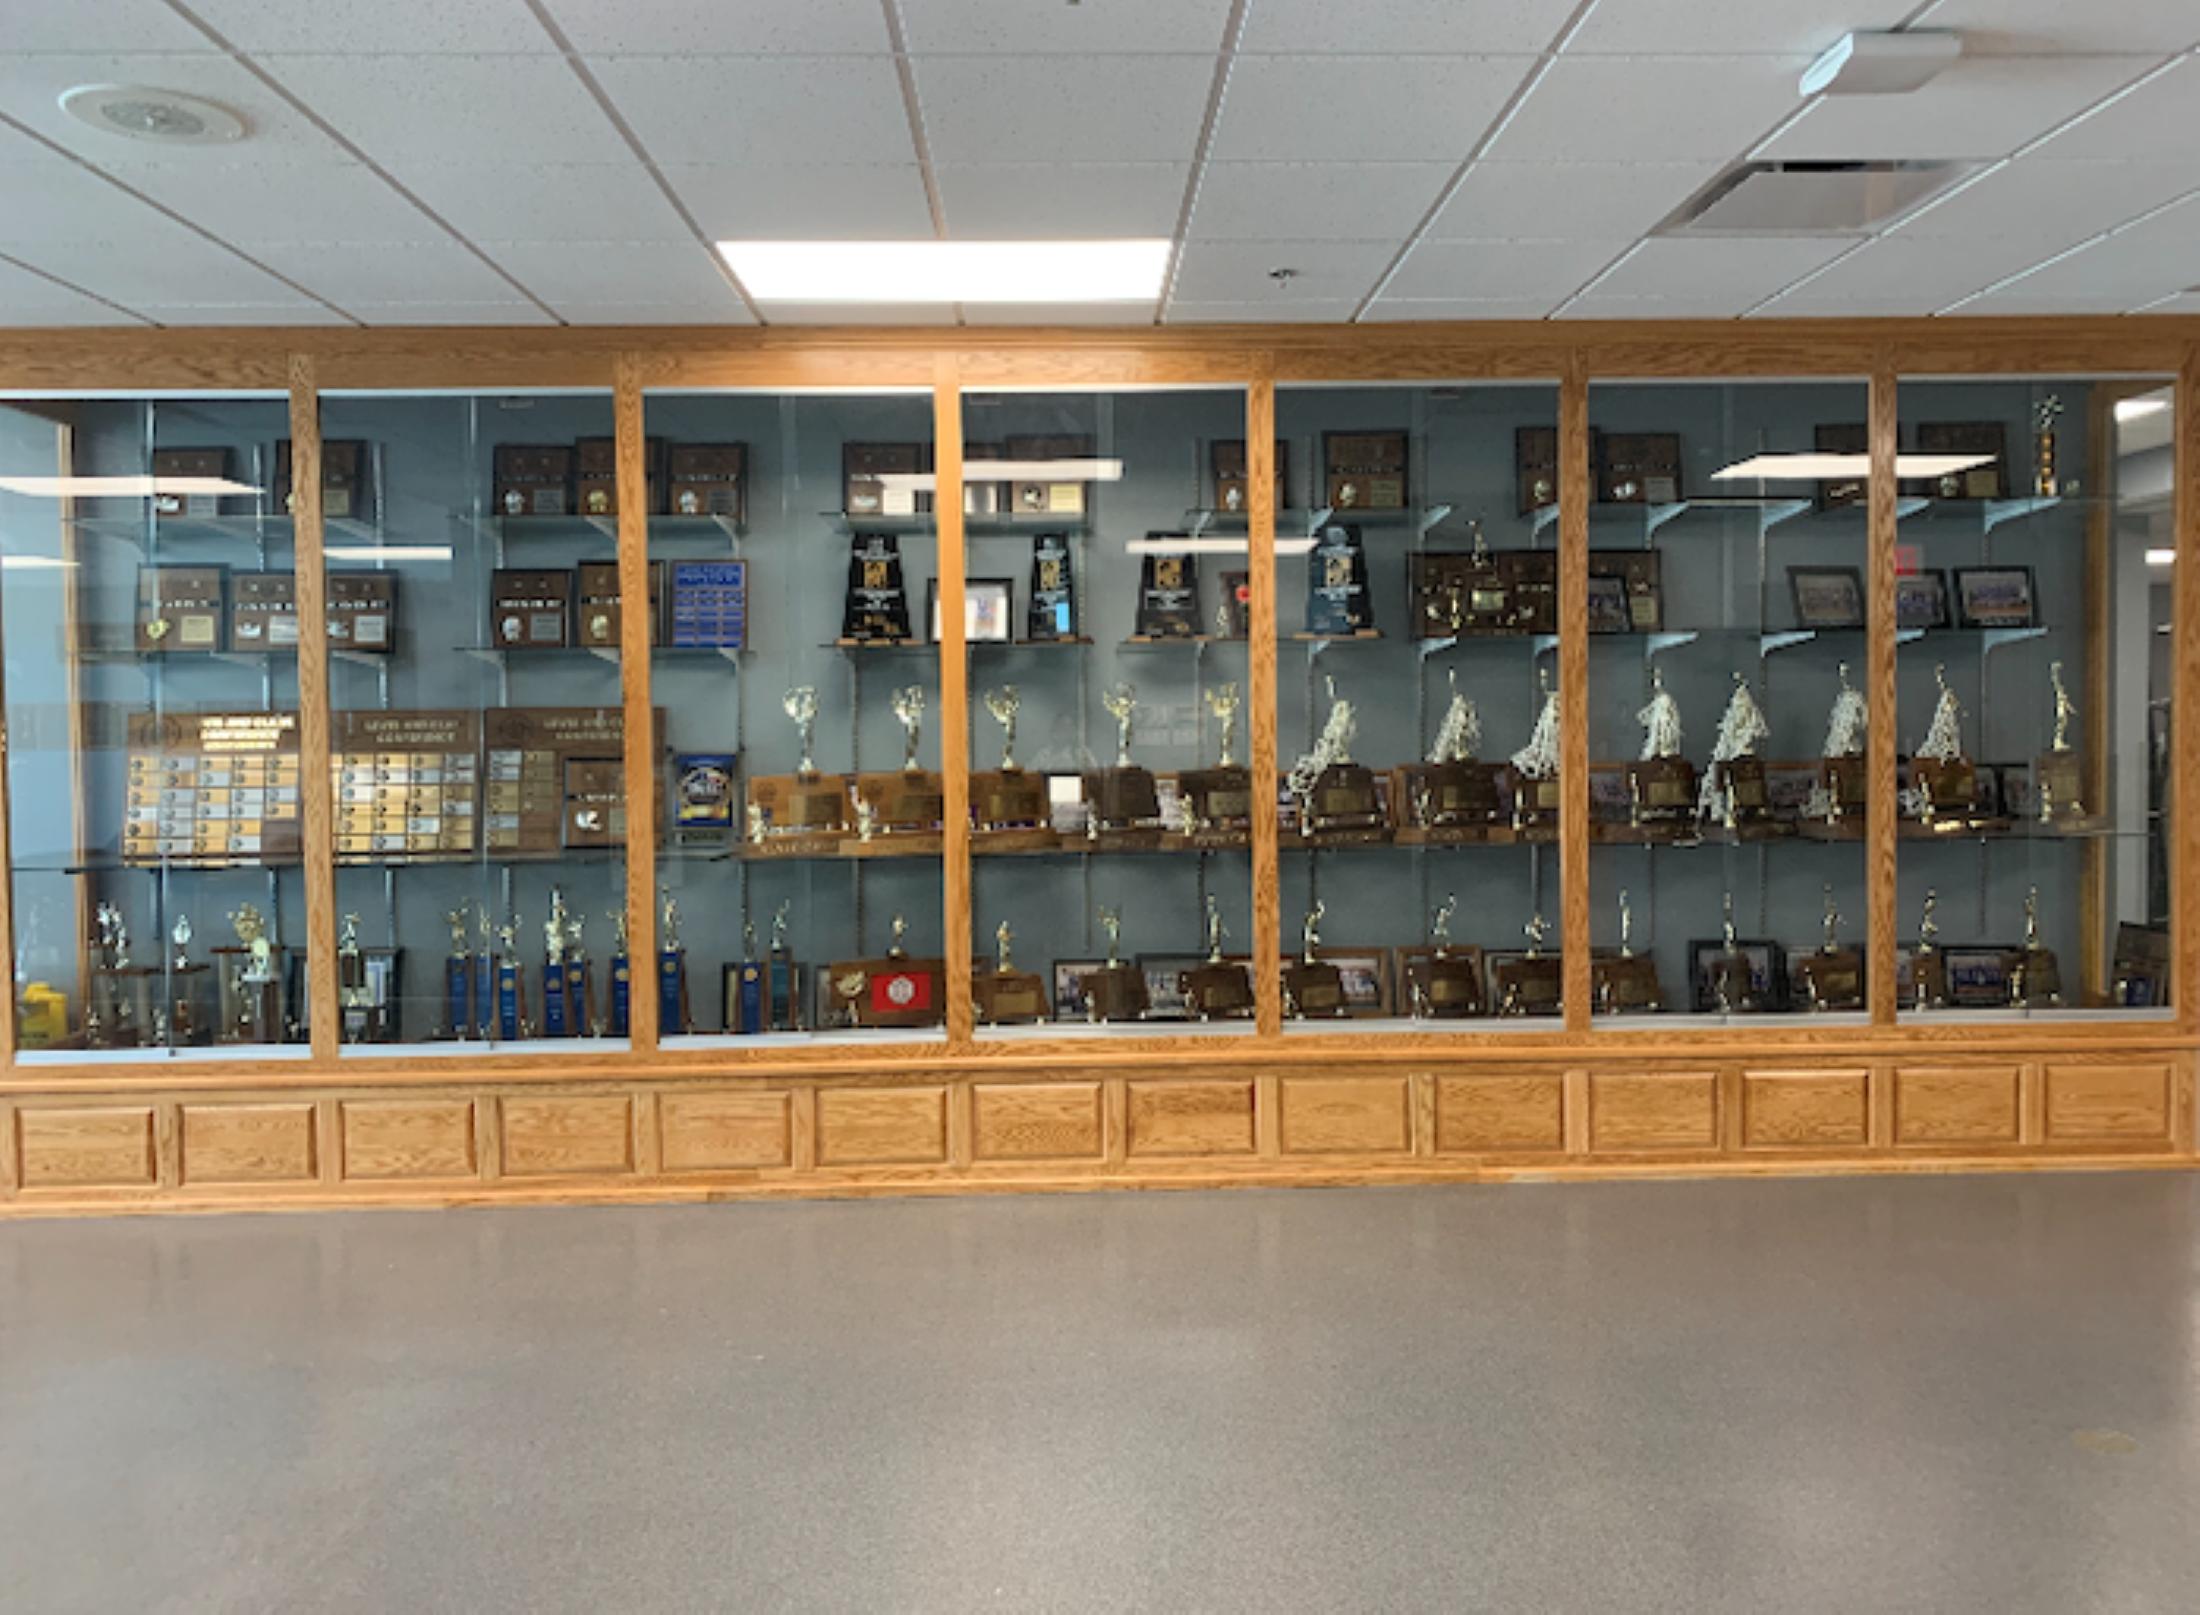 trophies 1 - Wynot Public Schools taking preventative measures against COVID-19